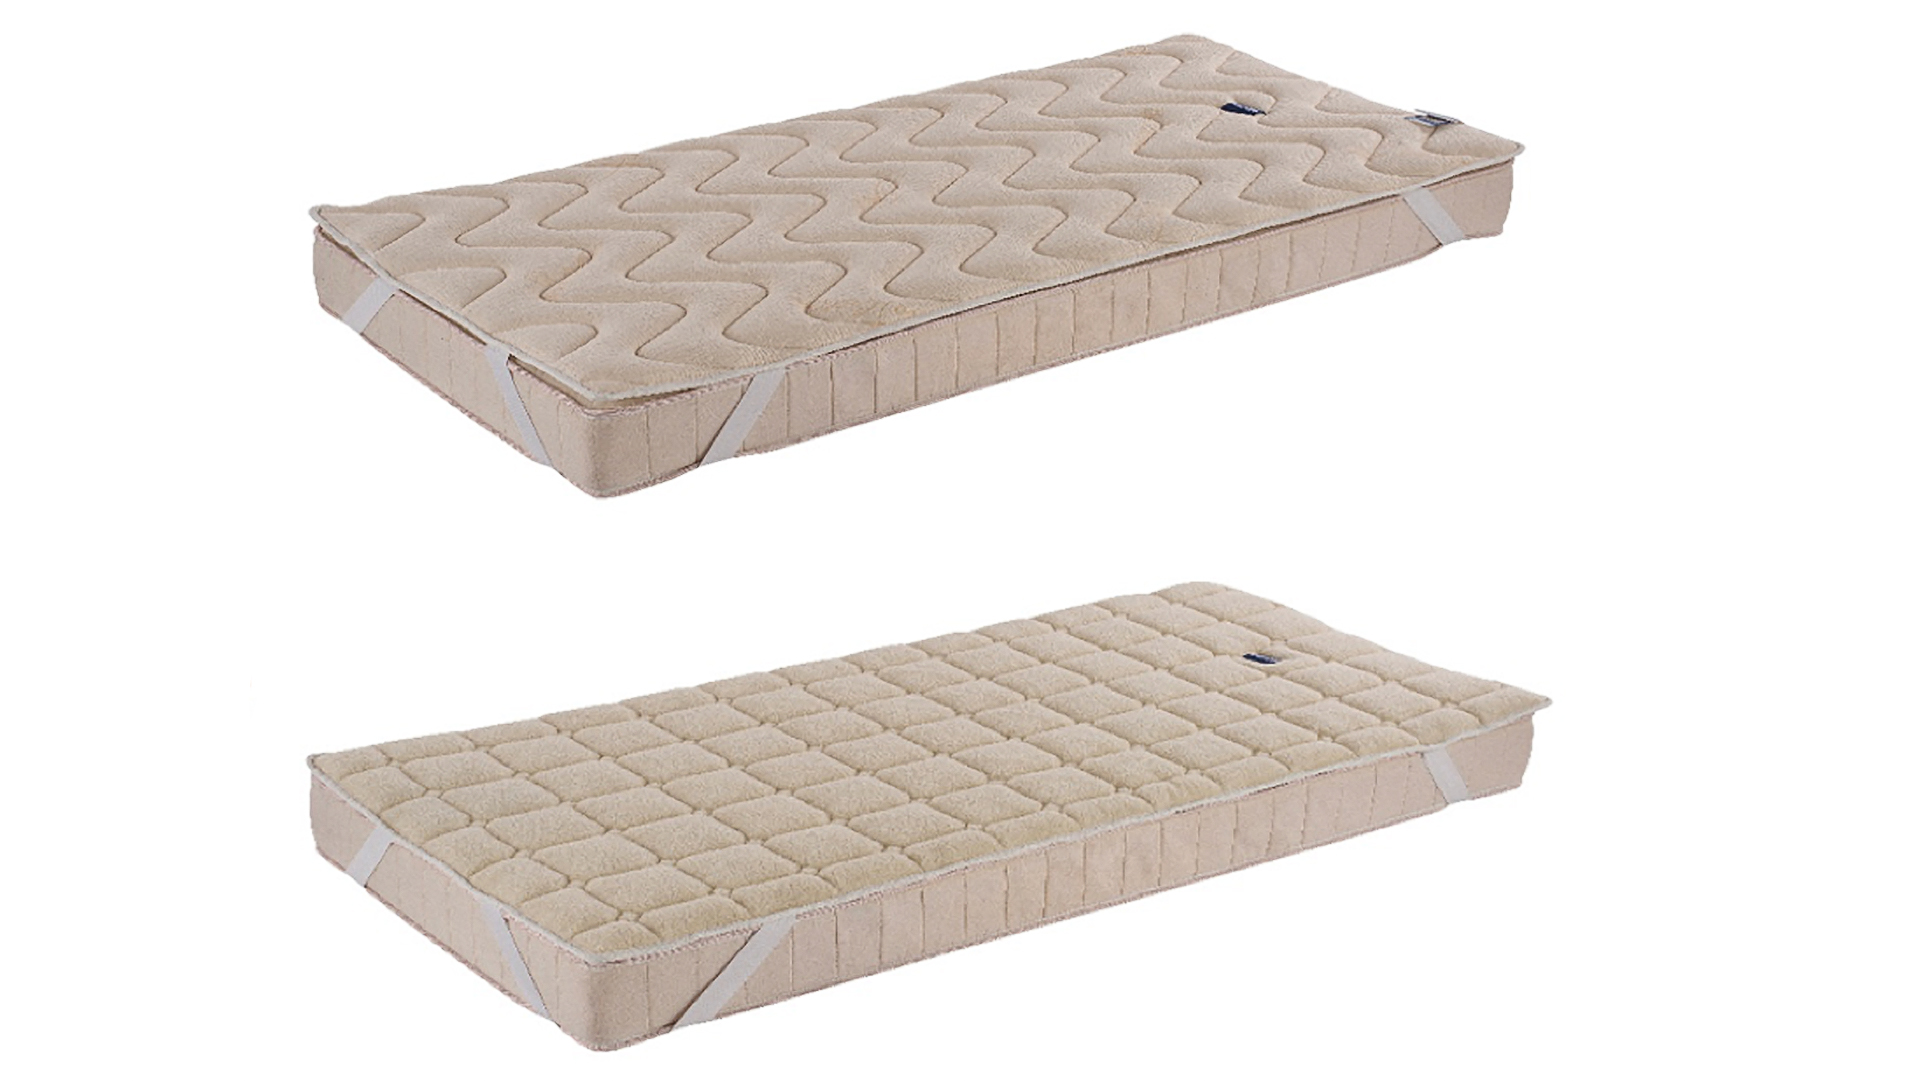 year-round reversible organic cotton or wool mattress topper